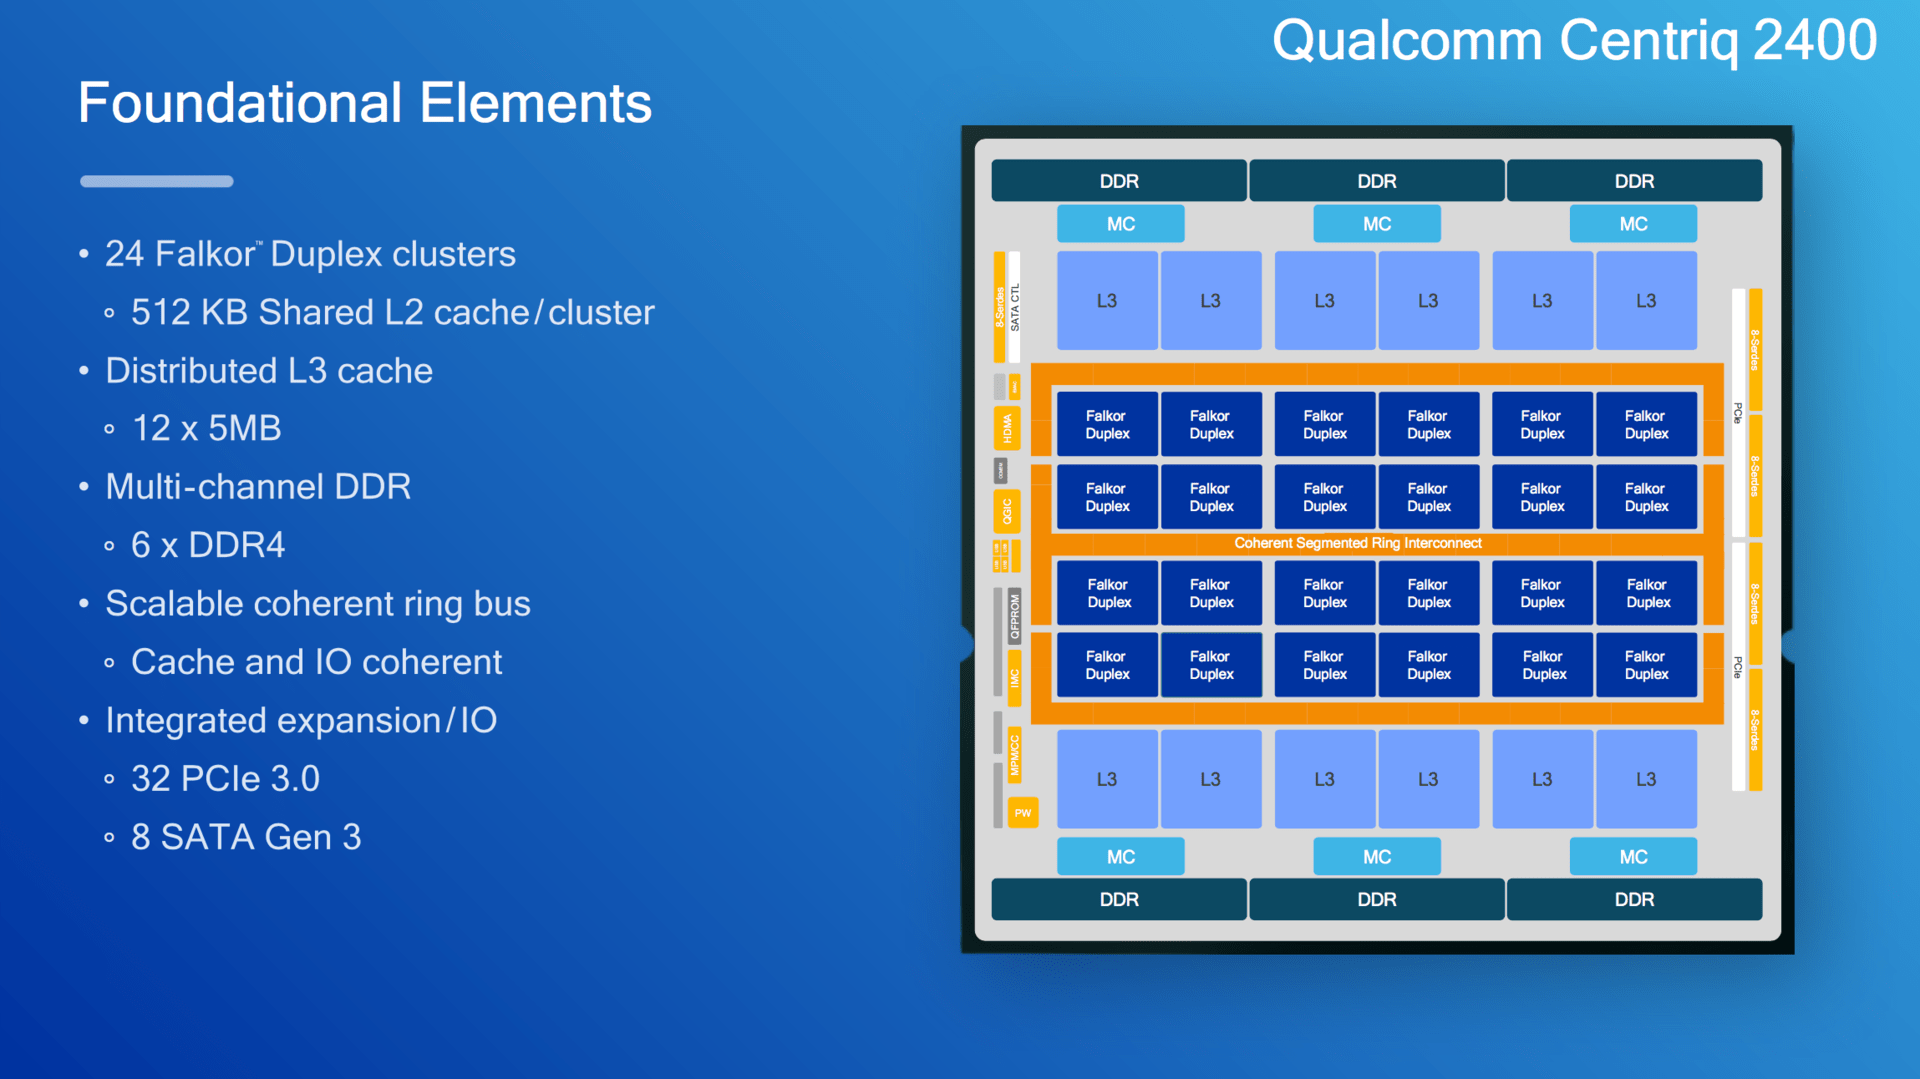 Qualcomm L2 LAN Treiber Windows 10